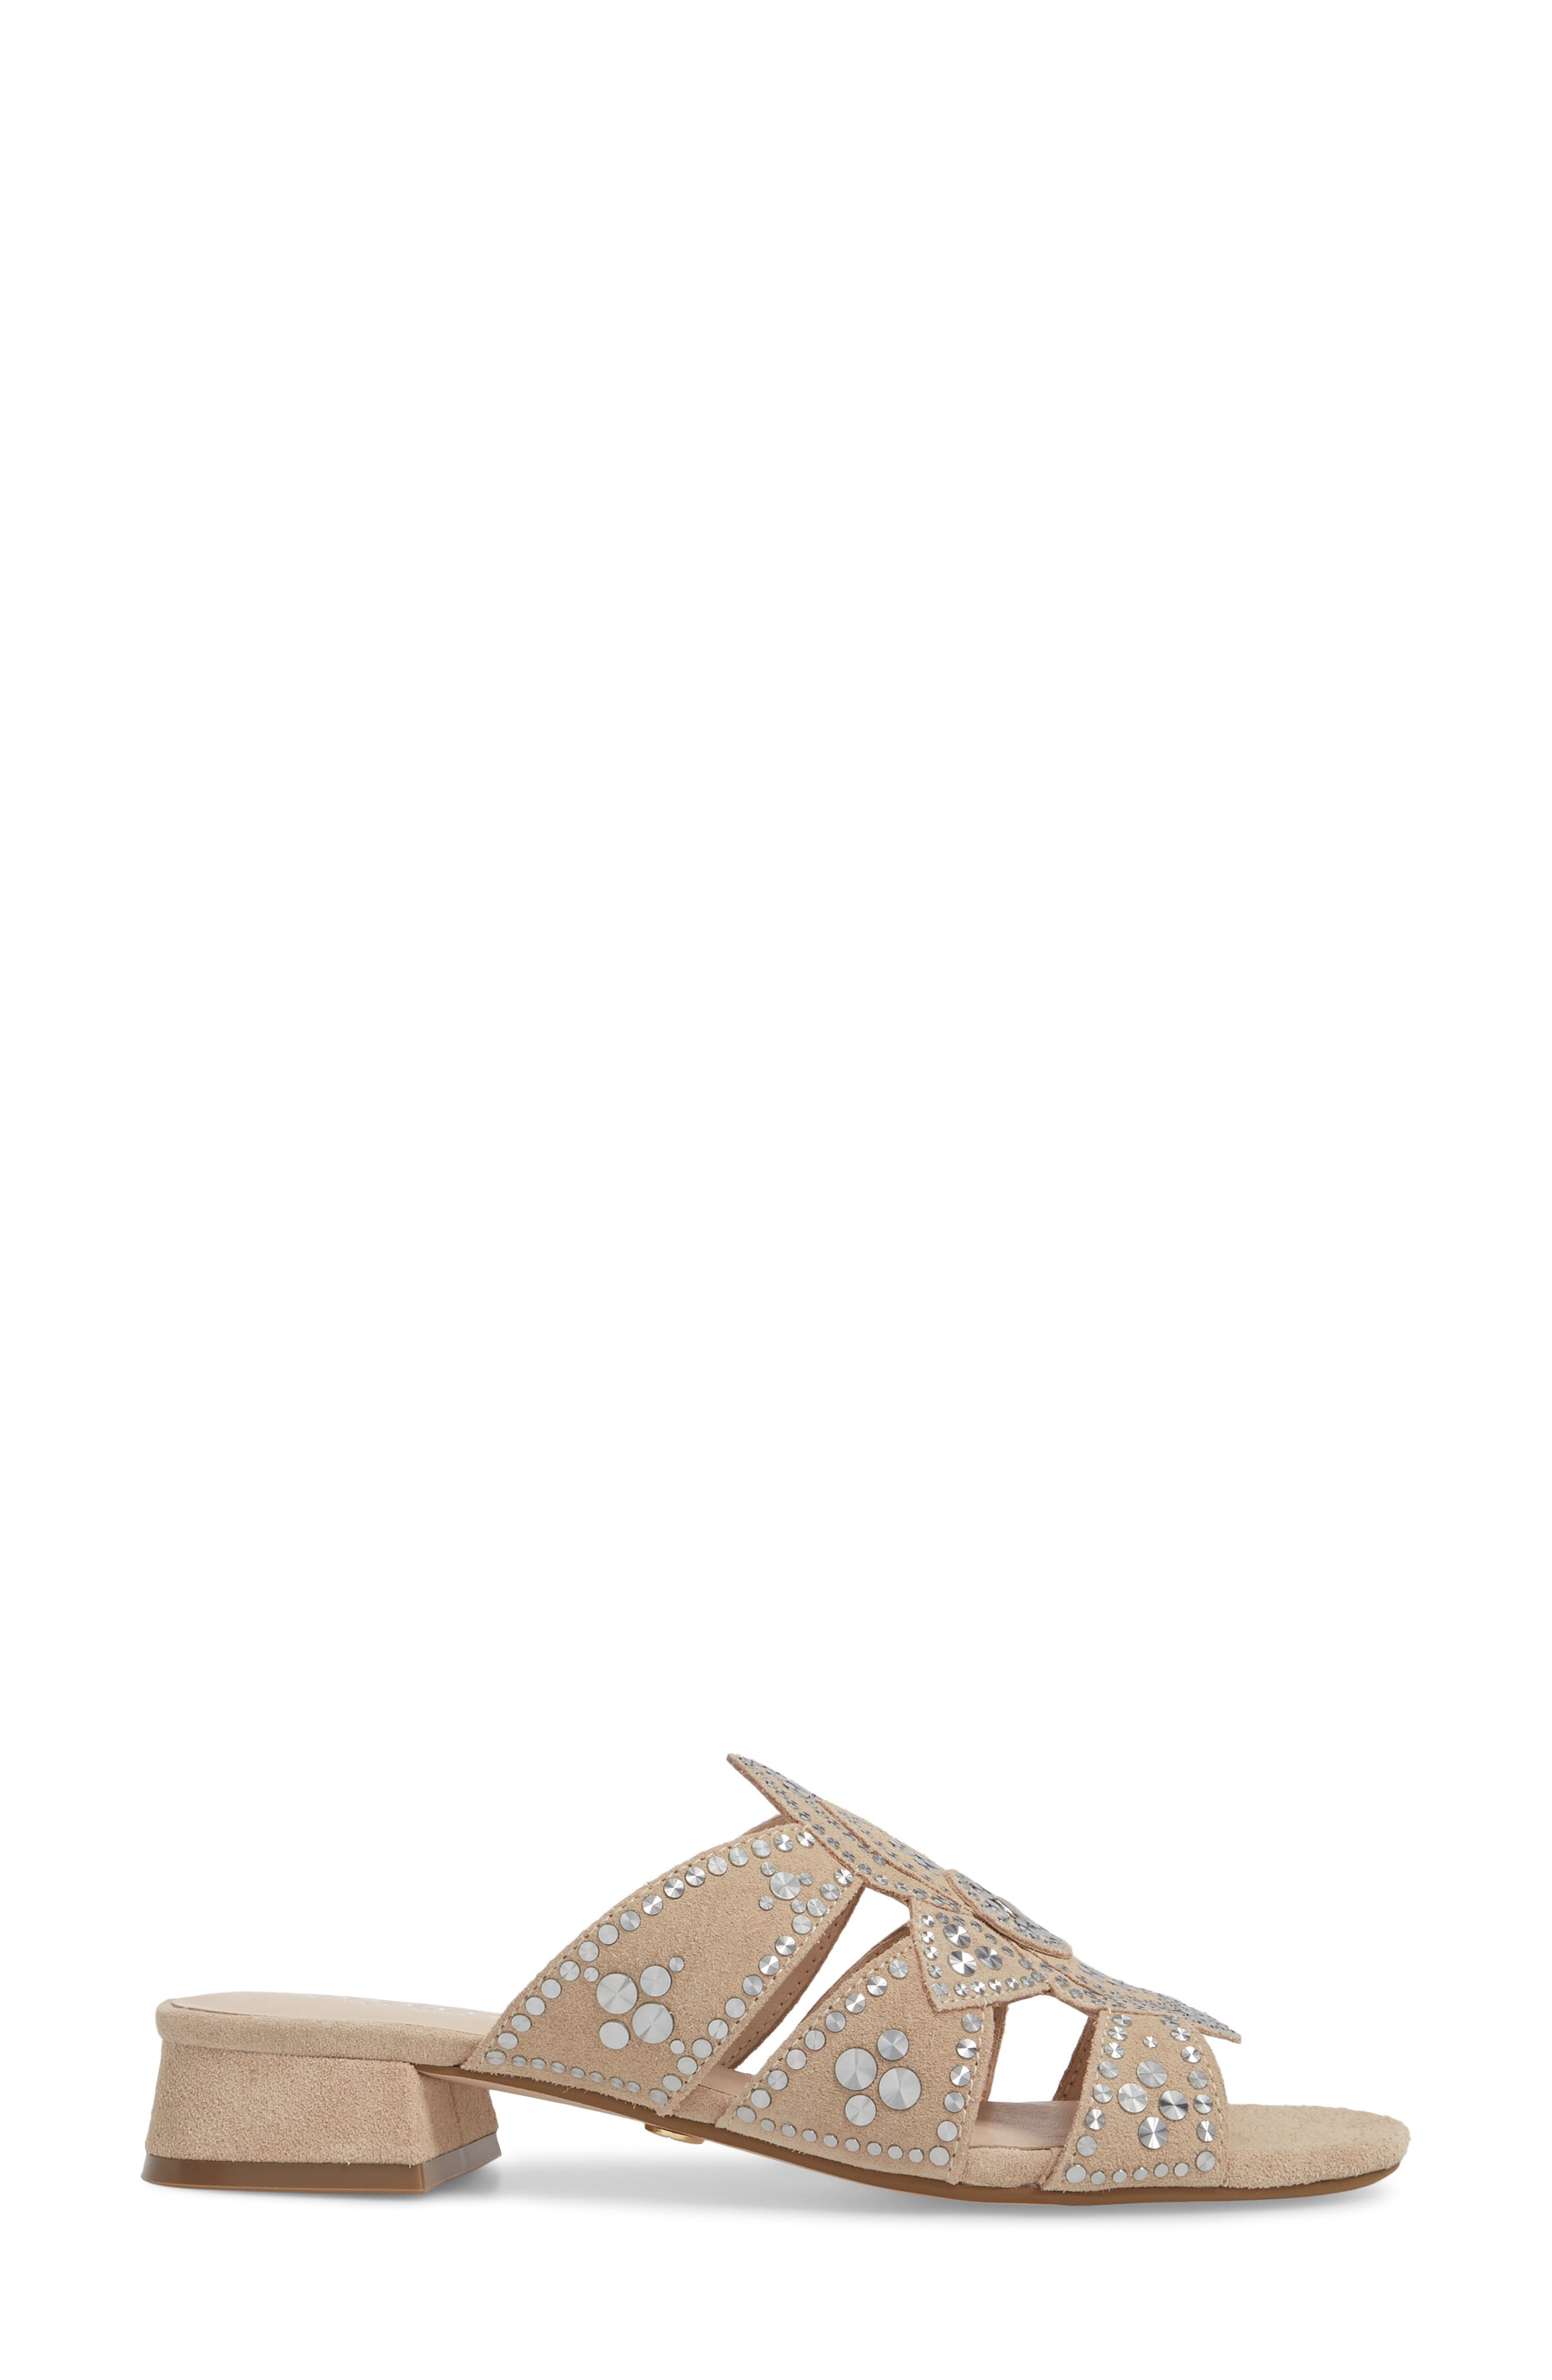 Martini Sandal,                             Alternate thumbnail 3, color,                             Bone Suede